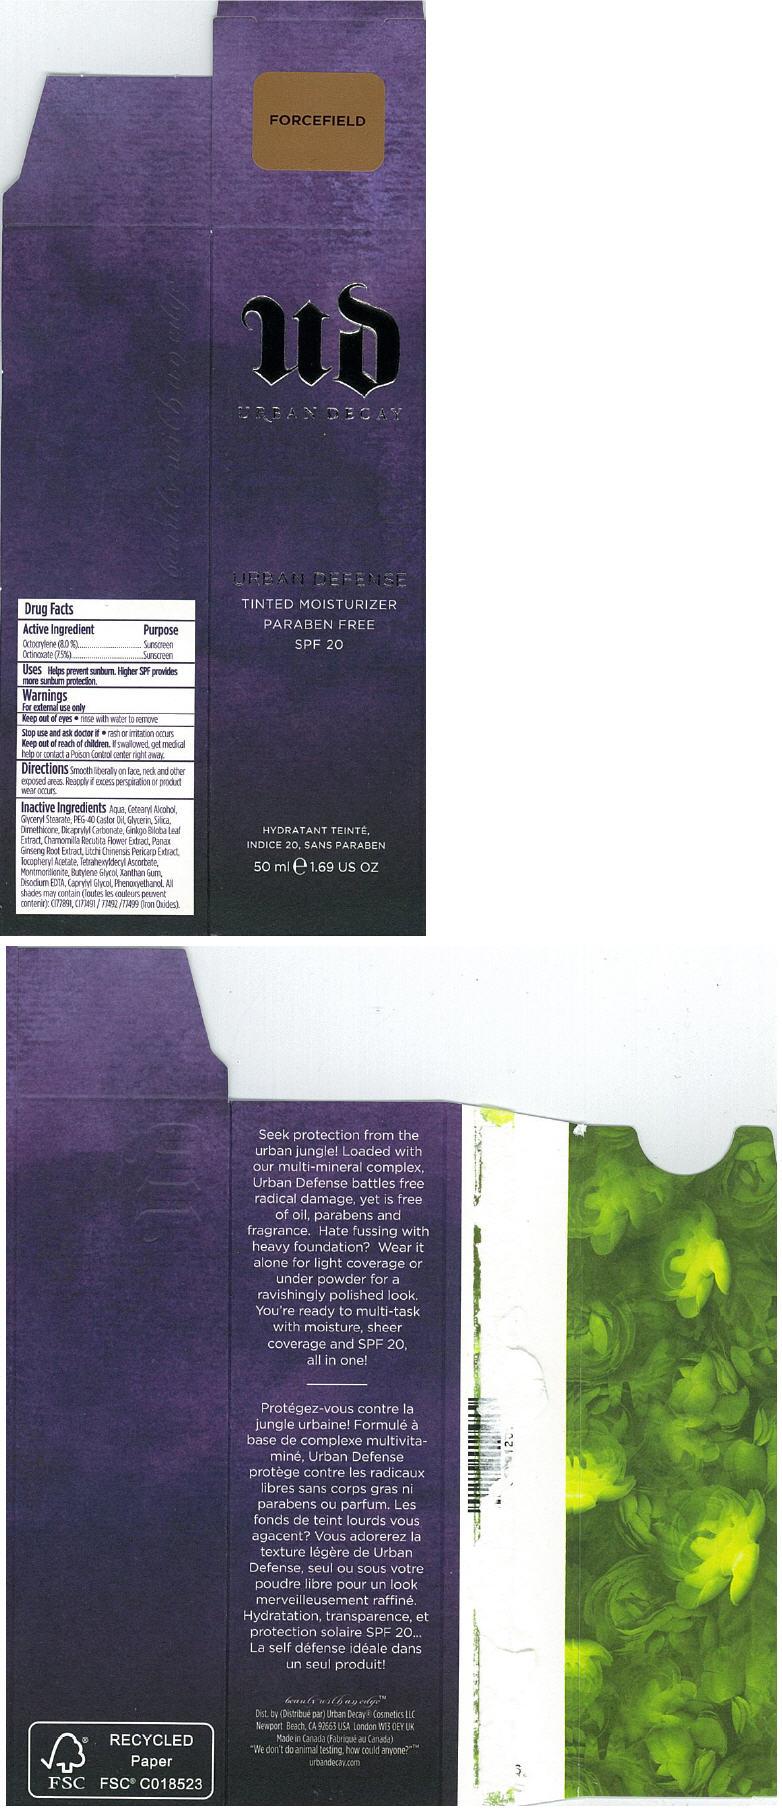 Principal Display Panel - 50 ml FORCEFIELD Carton